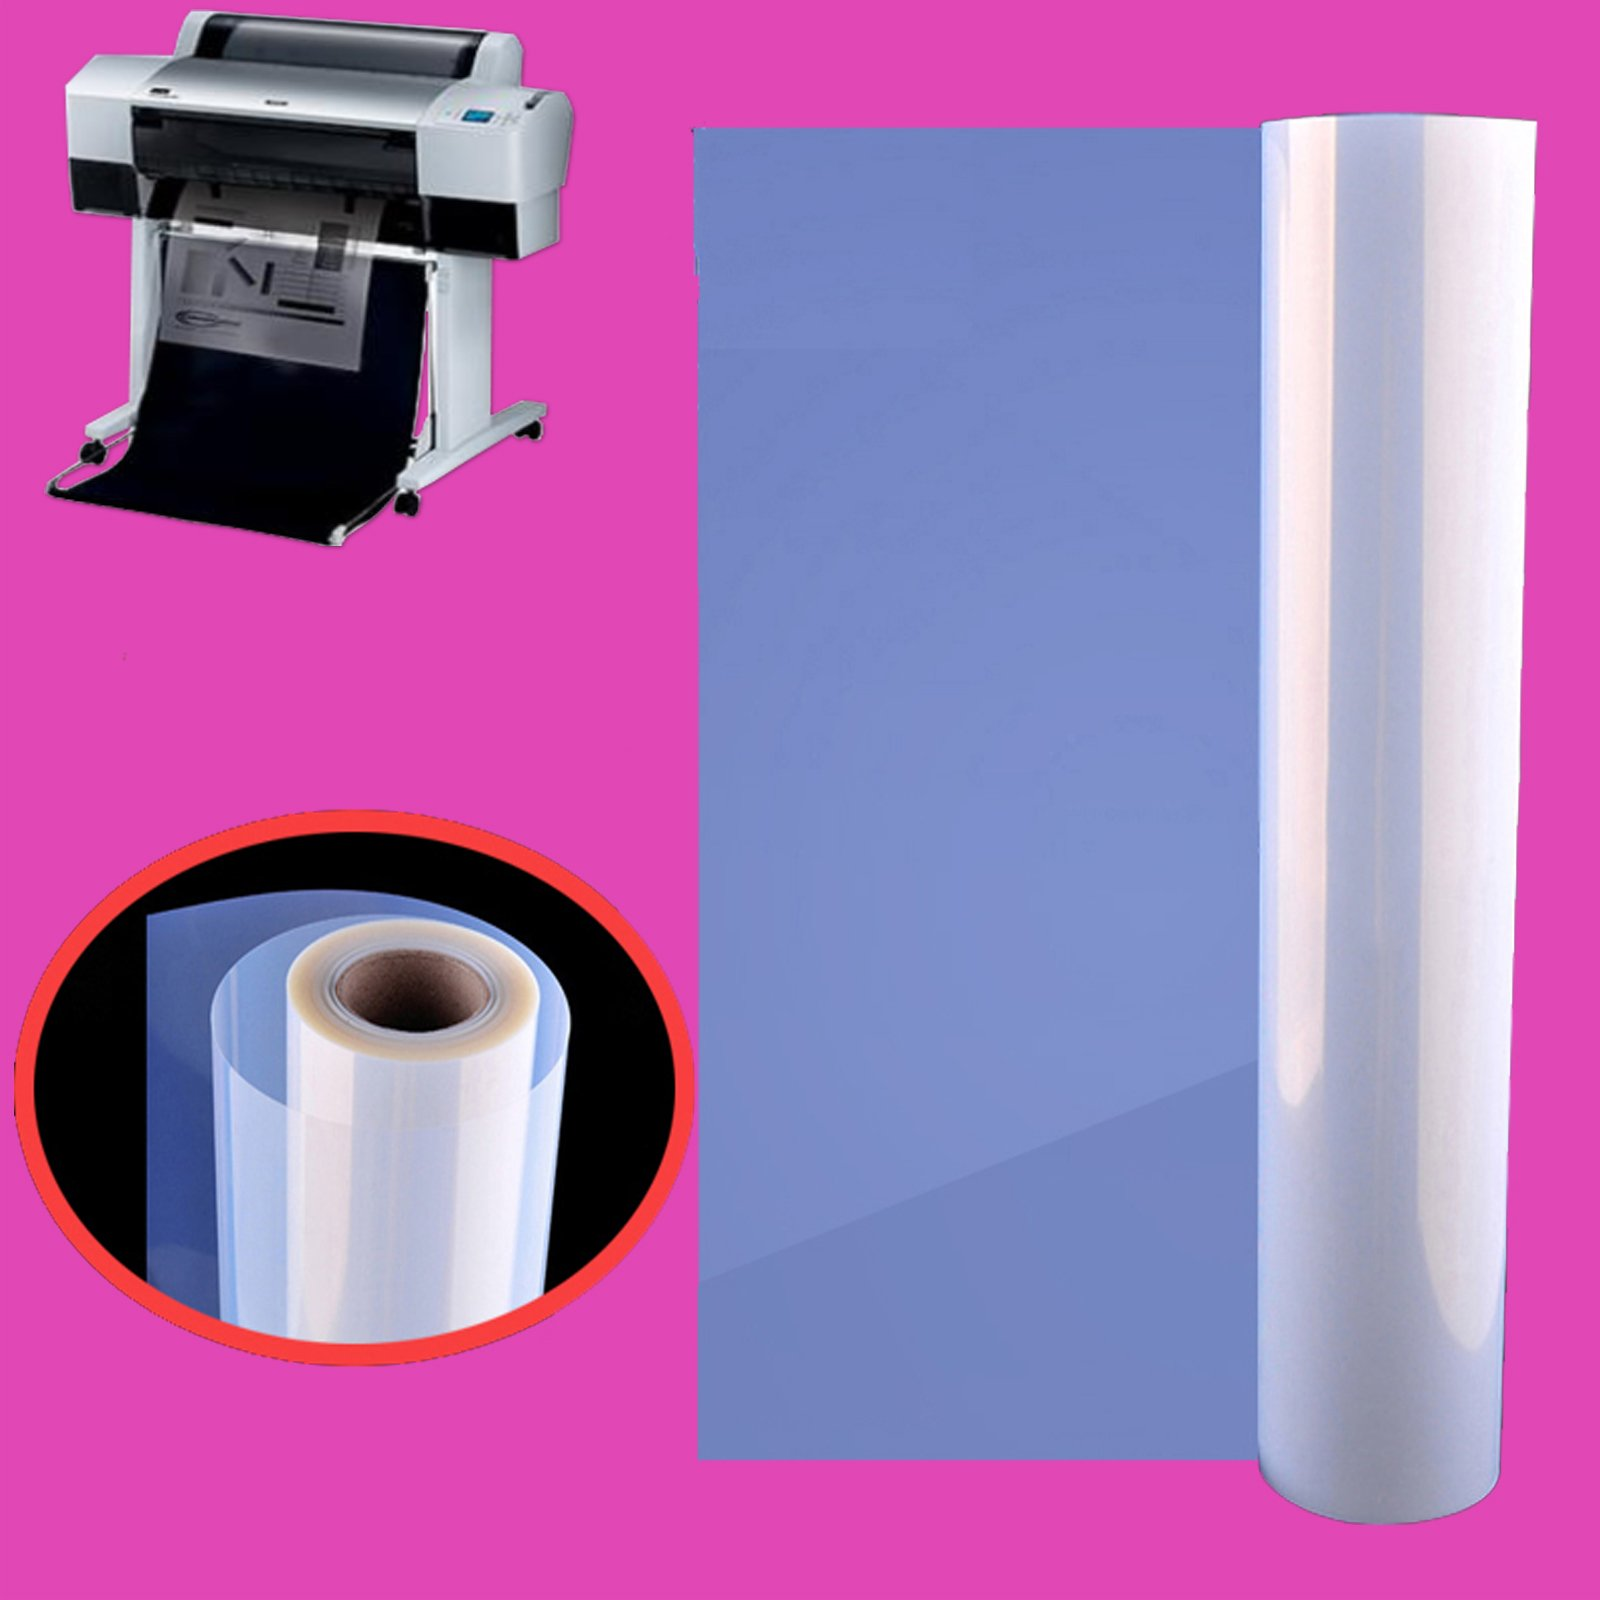 "2 Rolls,24'' x 82',3""core,Waterproof Inkjet Silk Screen Printing Transparency Film by Tiger-Hoo"